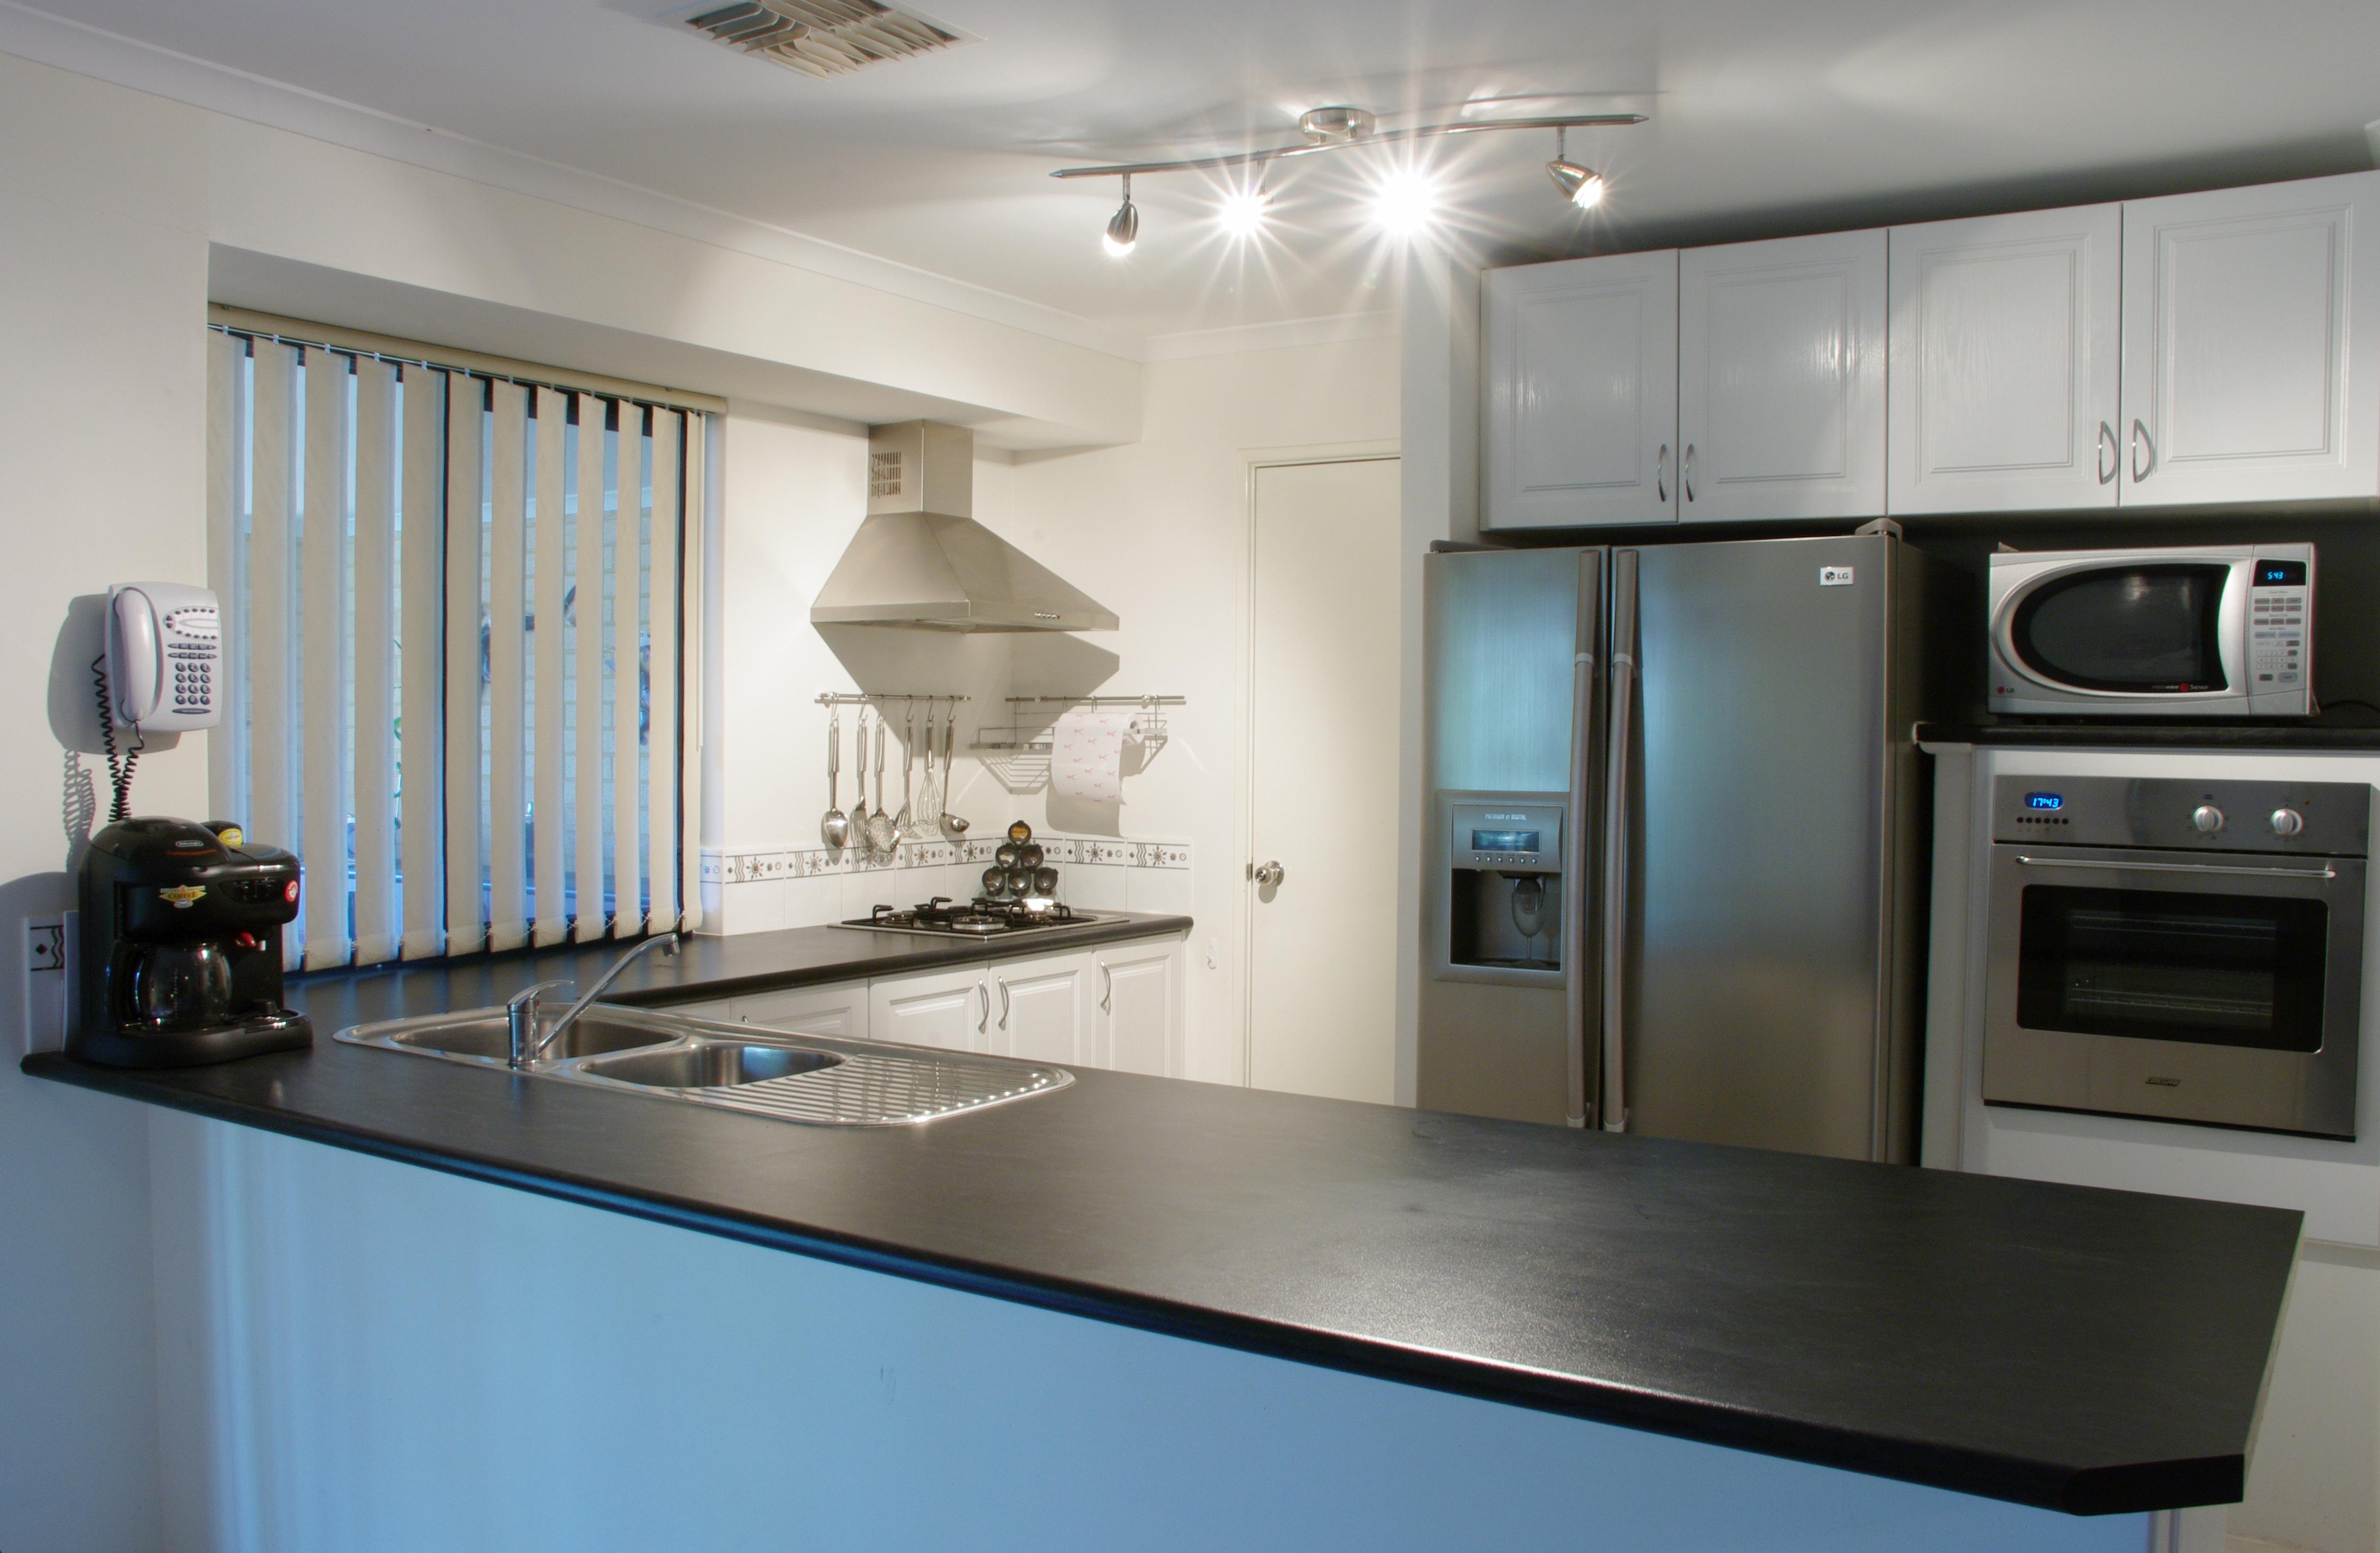 Kitchen microwave shelf photo - 2